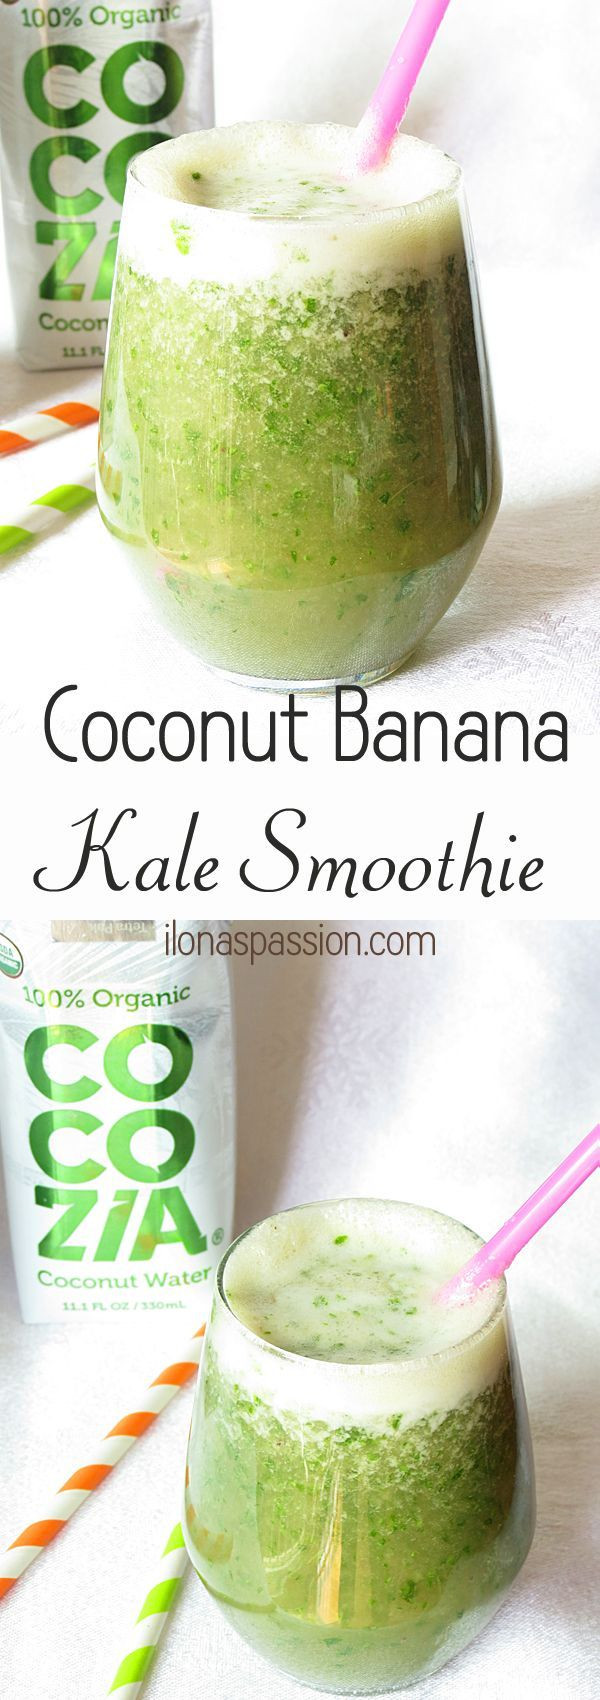 Kale Smoothie Recipes  kale smoothie recipes